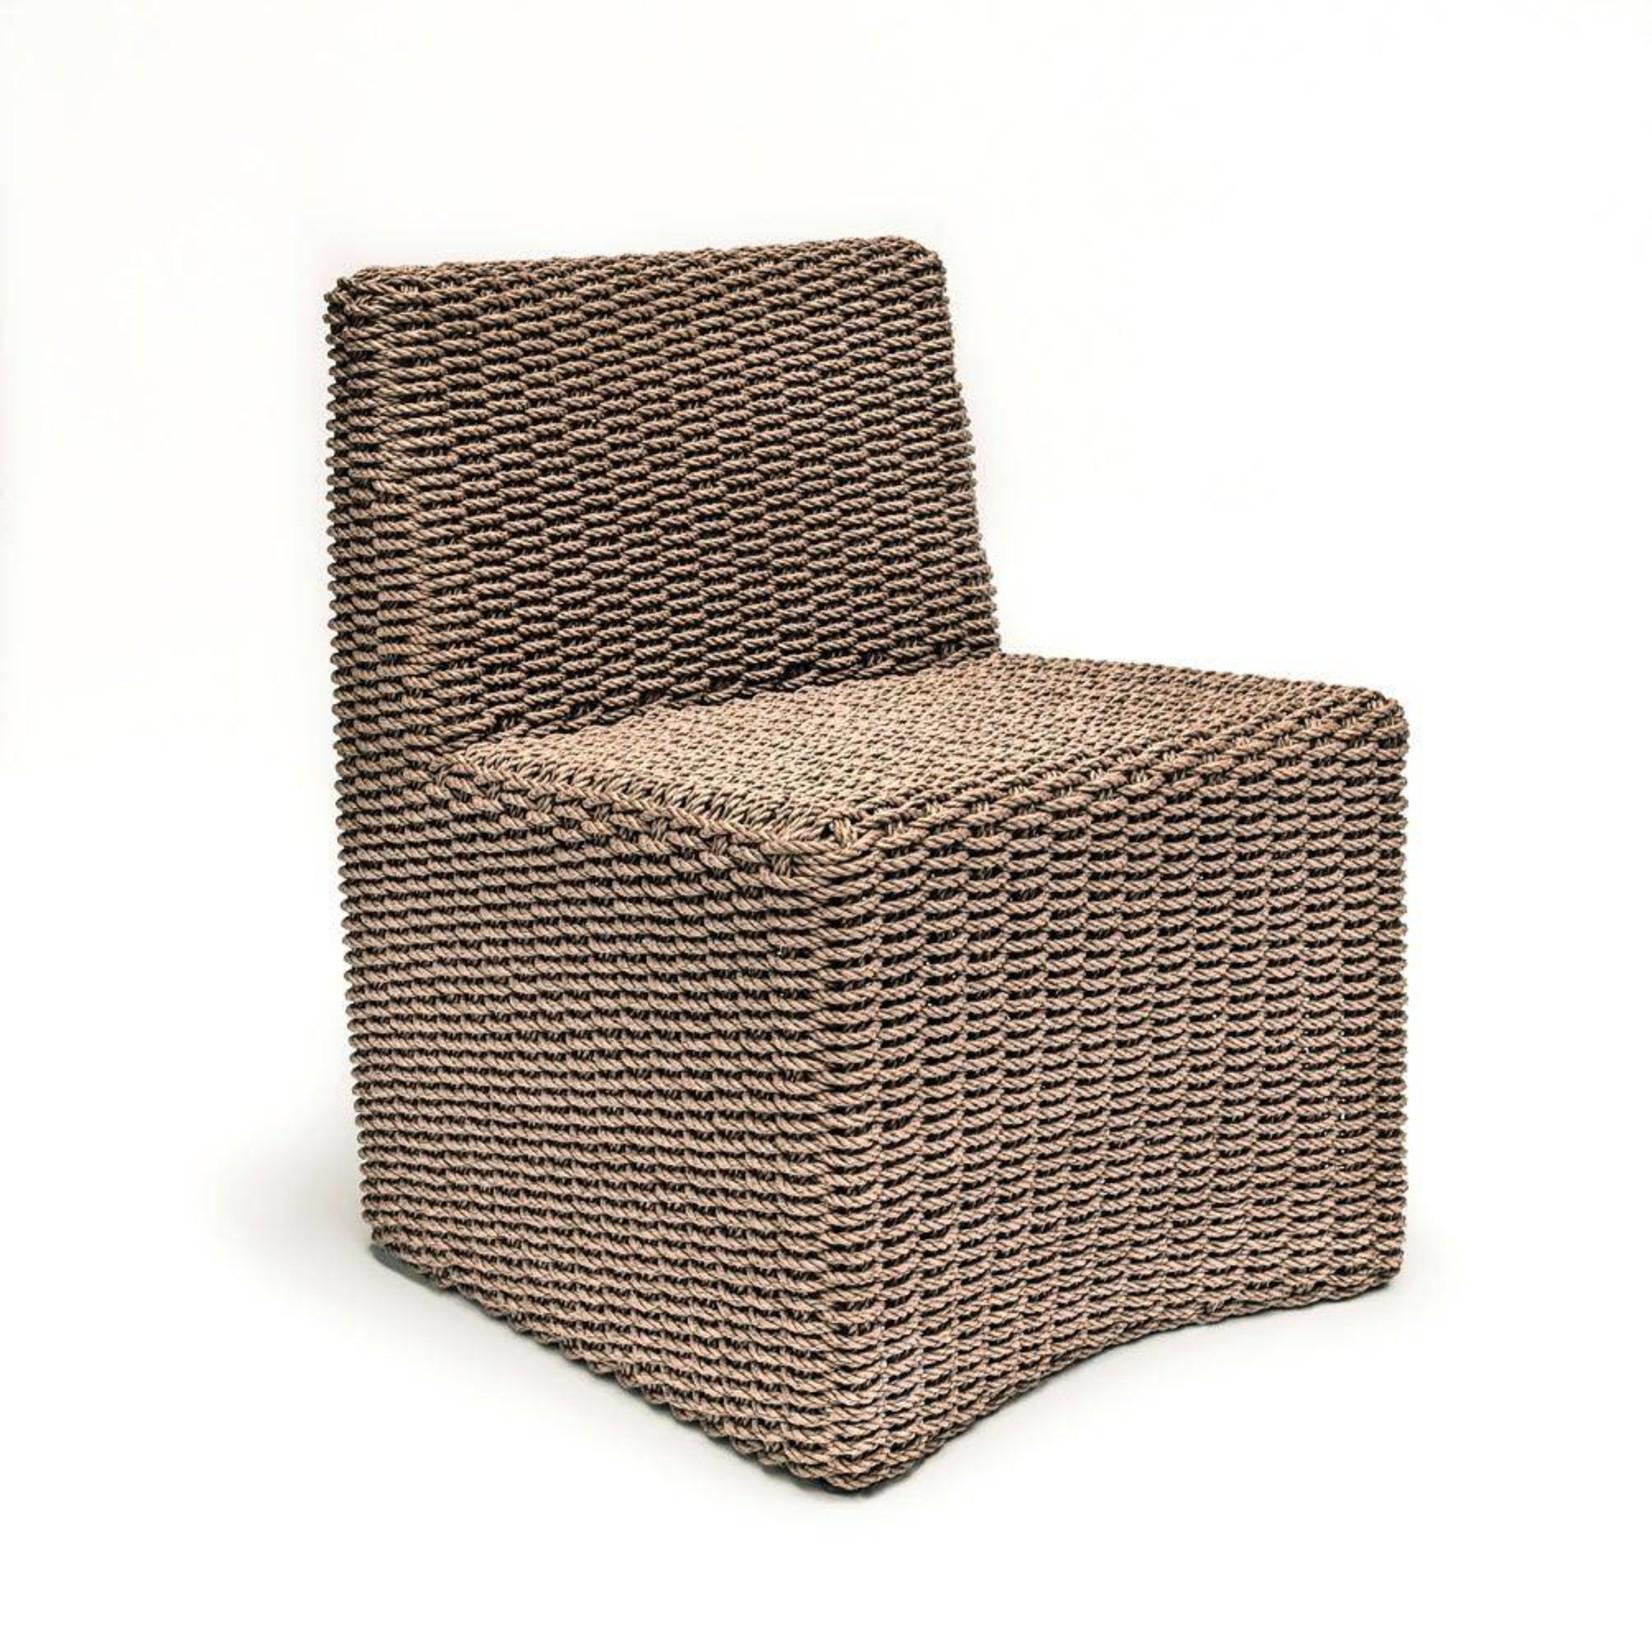 Gommaire Chair Claire   PE Wicker Natural 4 stuks incl. kussen